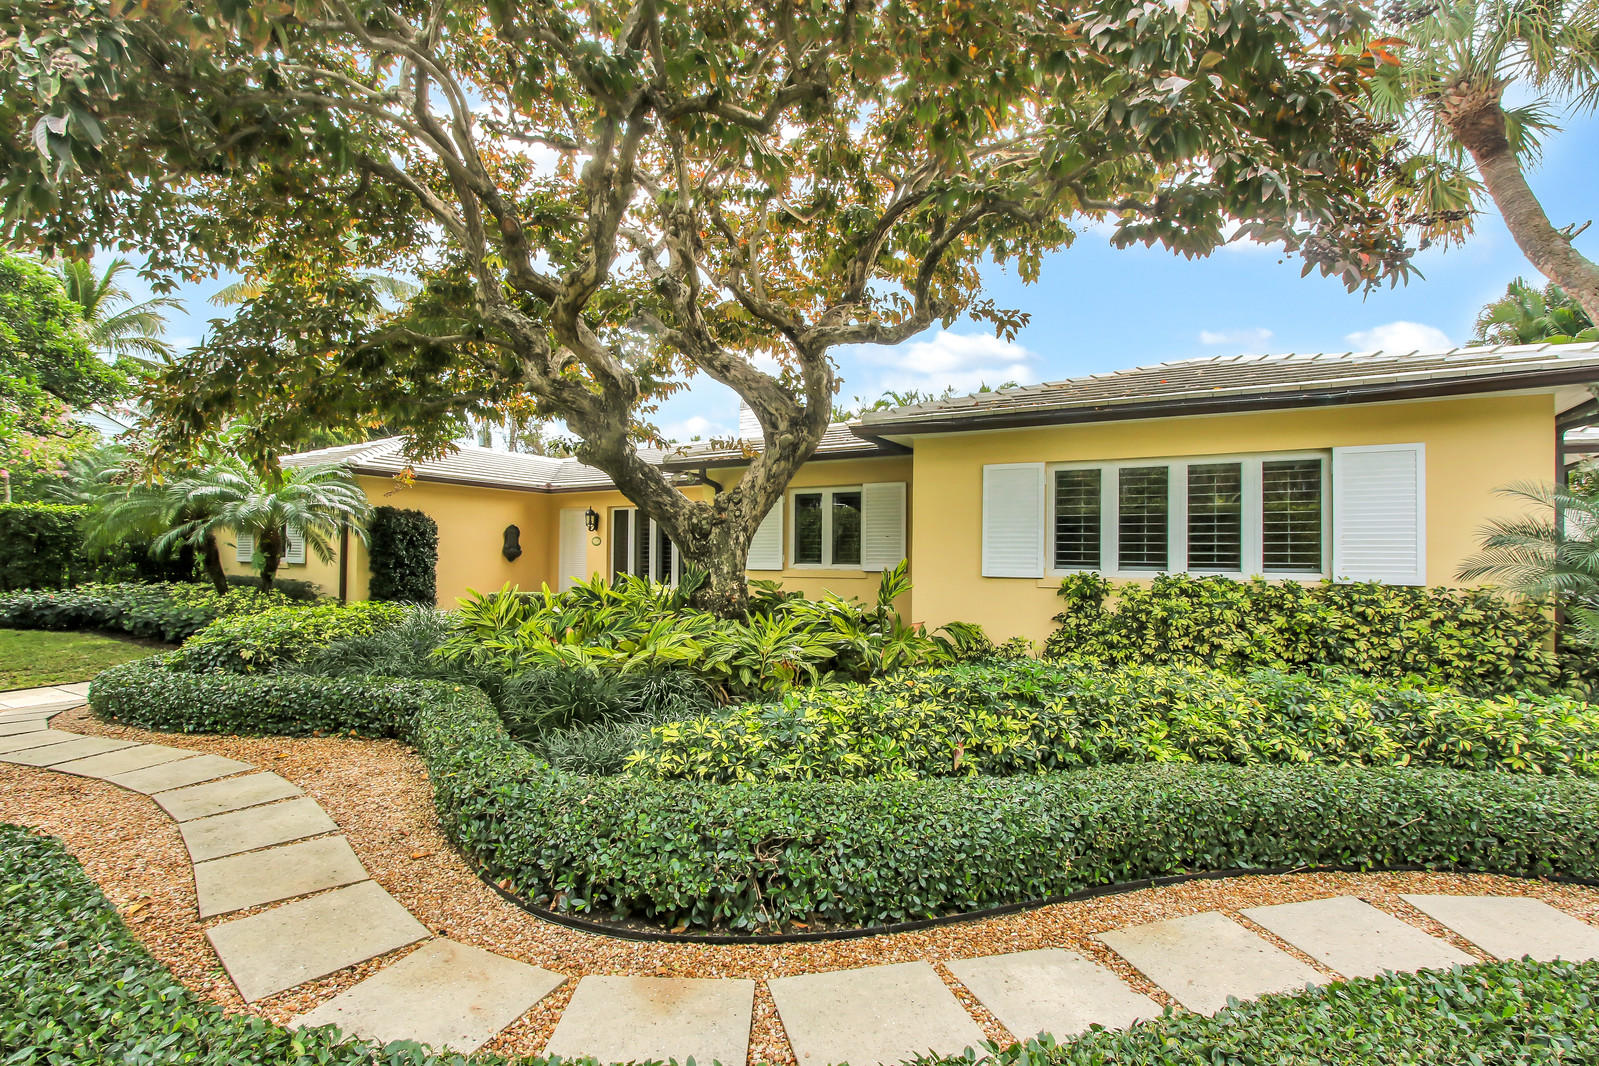 274 Monterey Road, Palm Beach, Florida 33480, 3 Bedrooms Bedrooms, ,3 BathroomsBathrooms,Single Family,For Sale,Monterey,RX-10504544